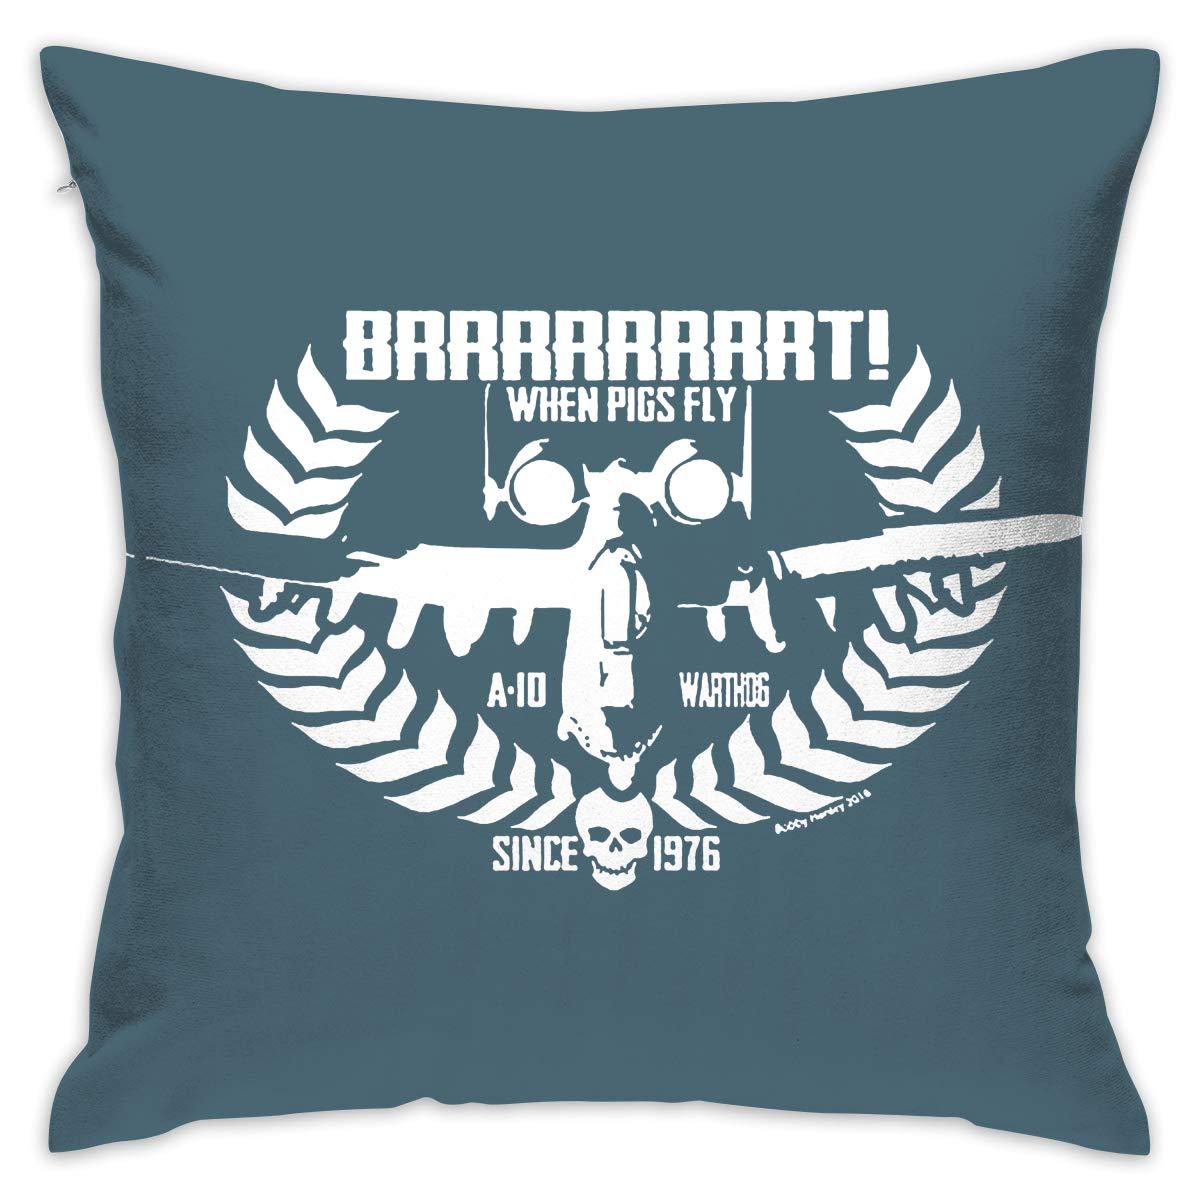 Amazon.com: Create Magic - Warthog Since 1976 Throw Pillow ...